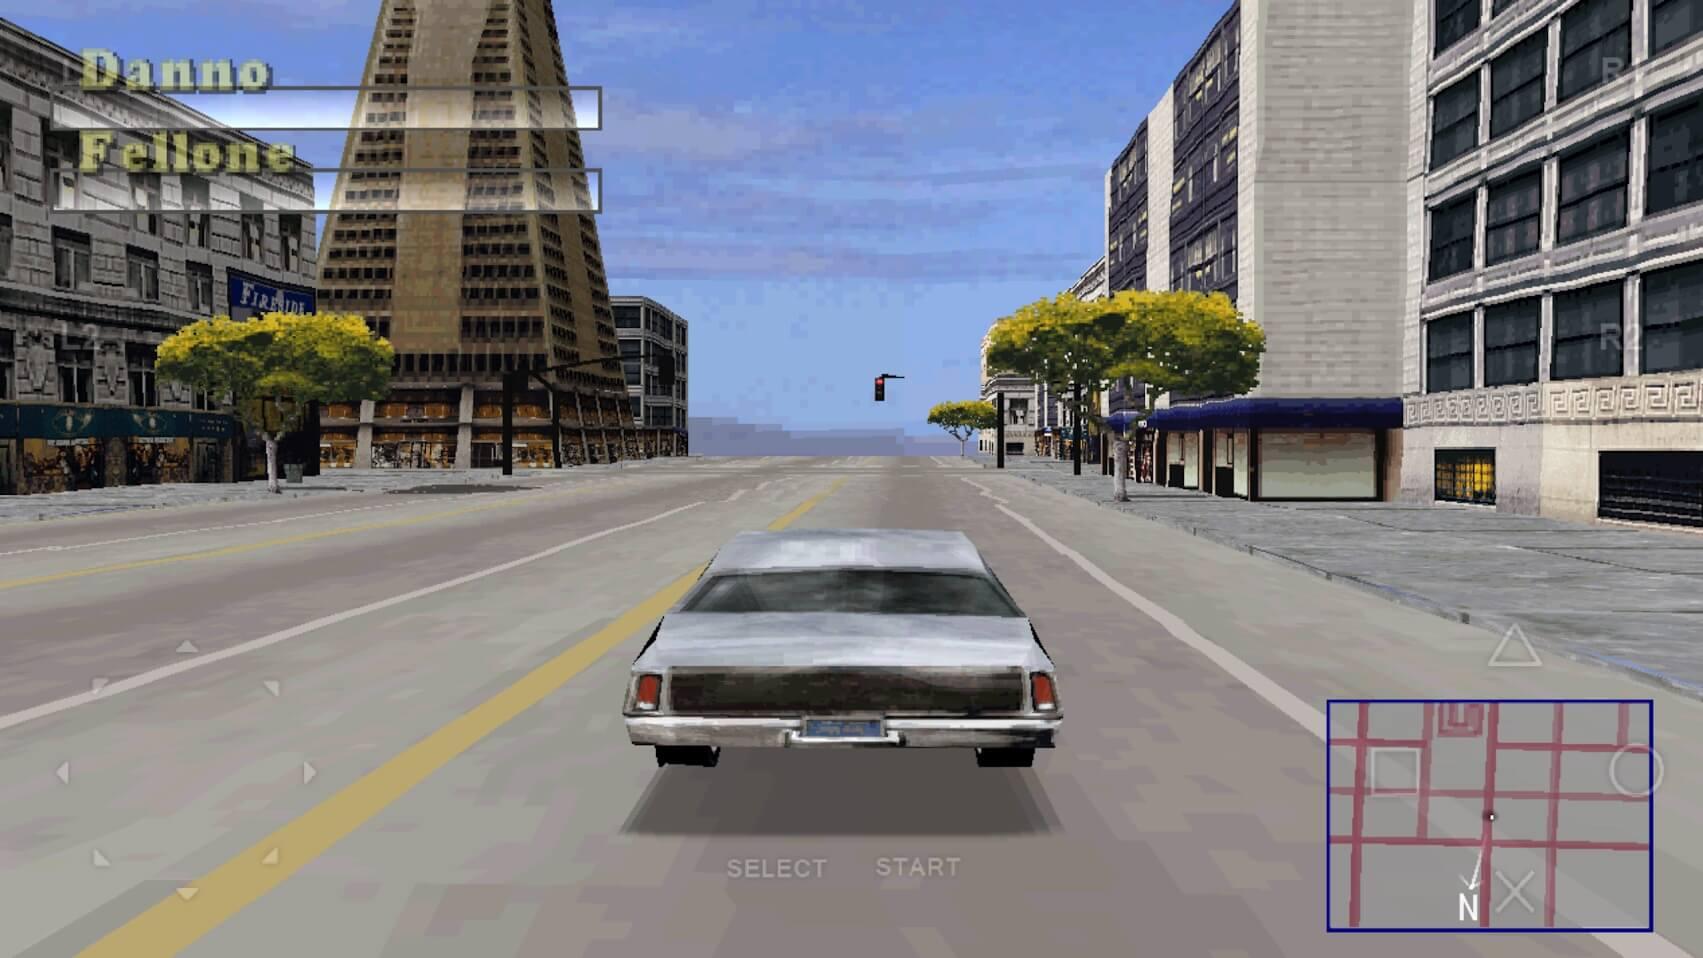 Best Emulators for Android - FPse Gameplay